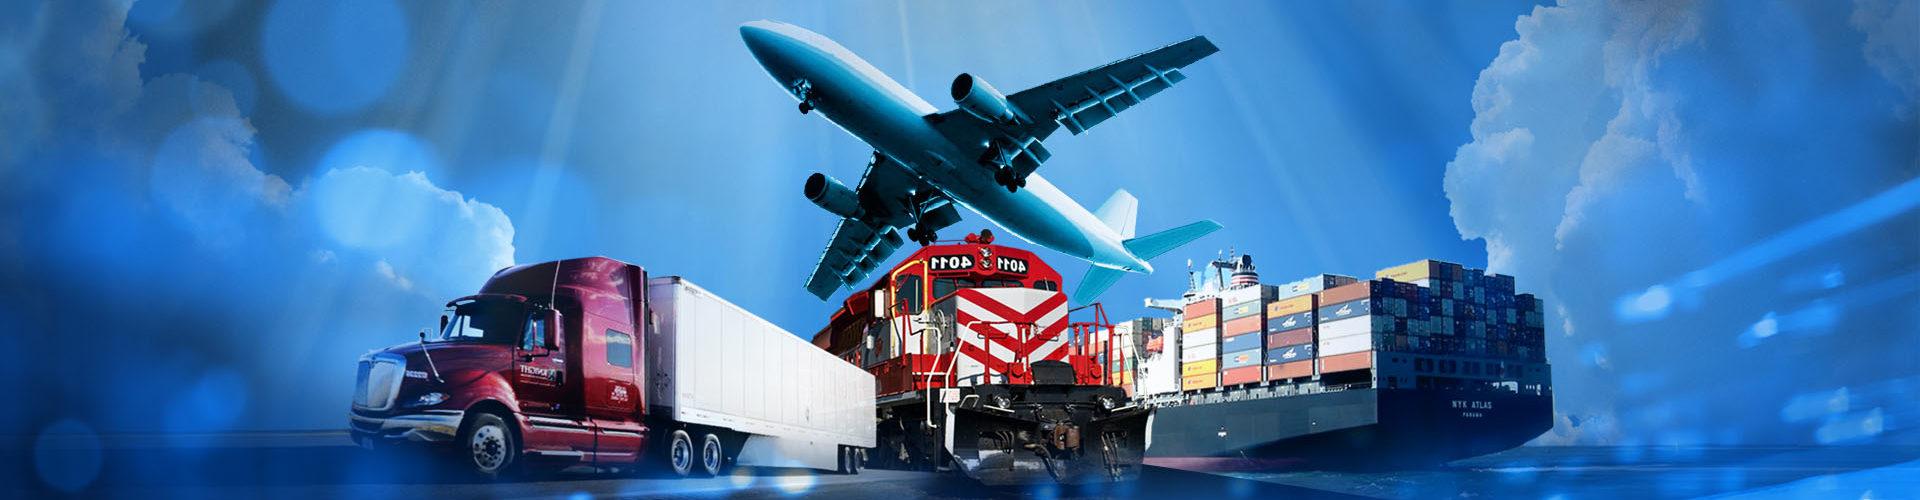 Rapid Line Logistics Company Mumbai | Warehouse & Transport